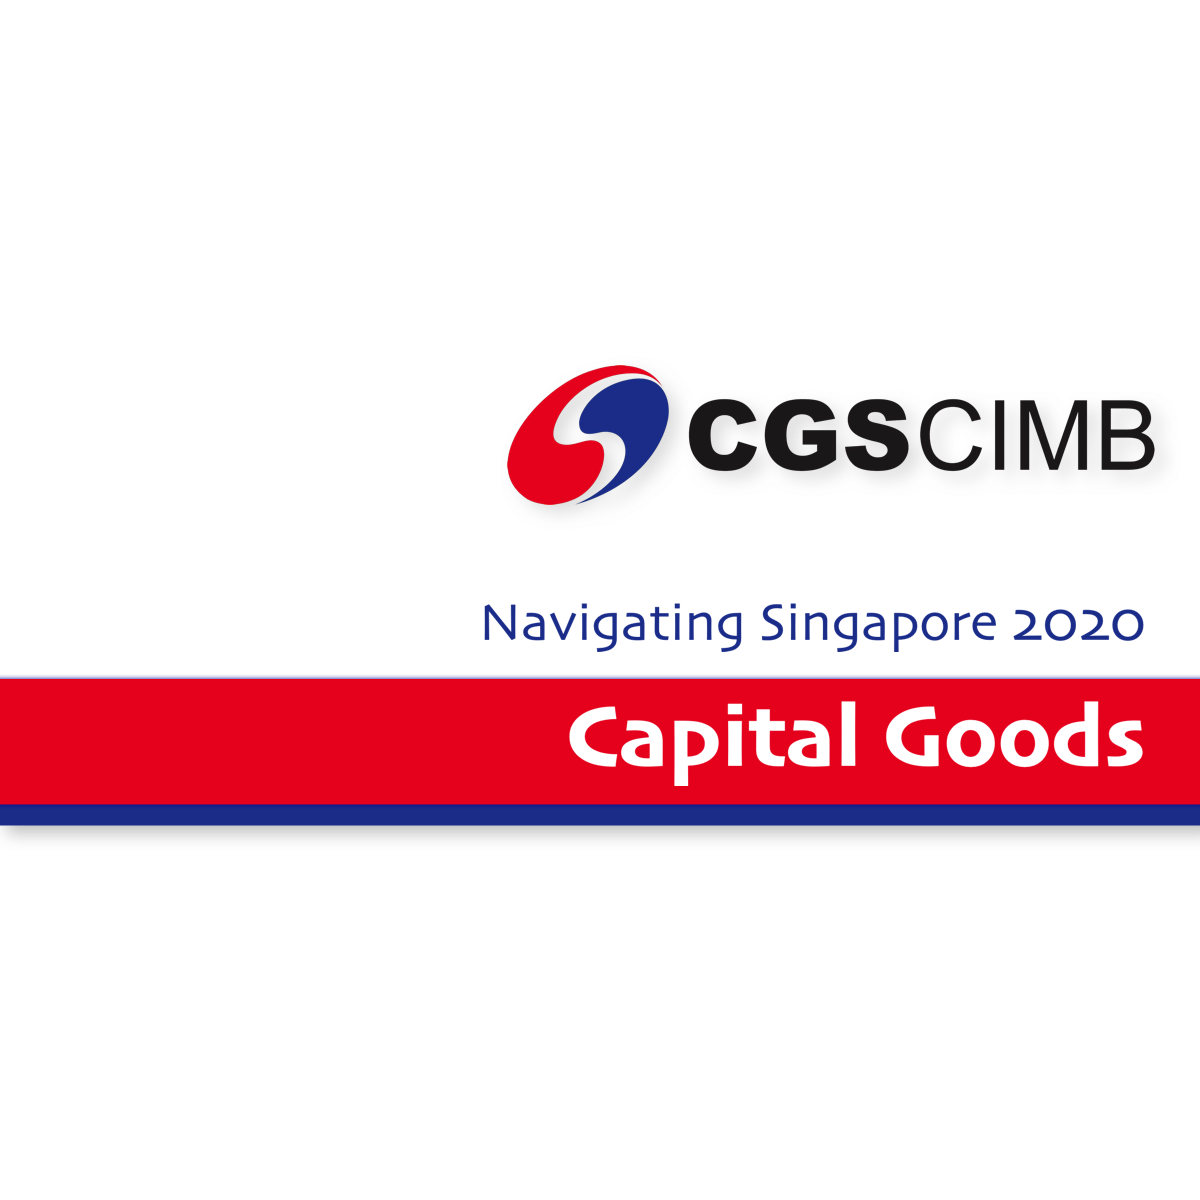 Capital Goods Sector 2020 Outlook - CGS-CIMB Research | SGinvestors.io